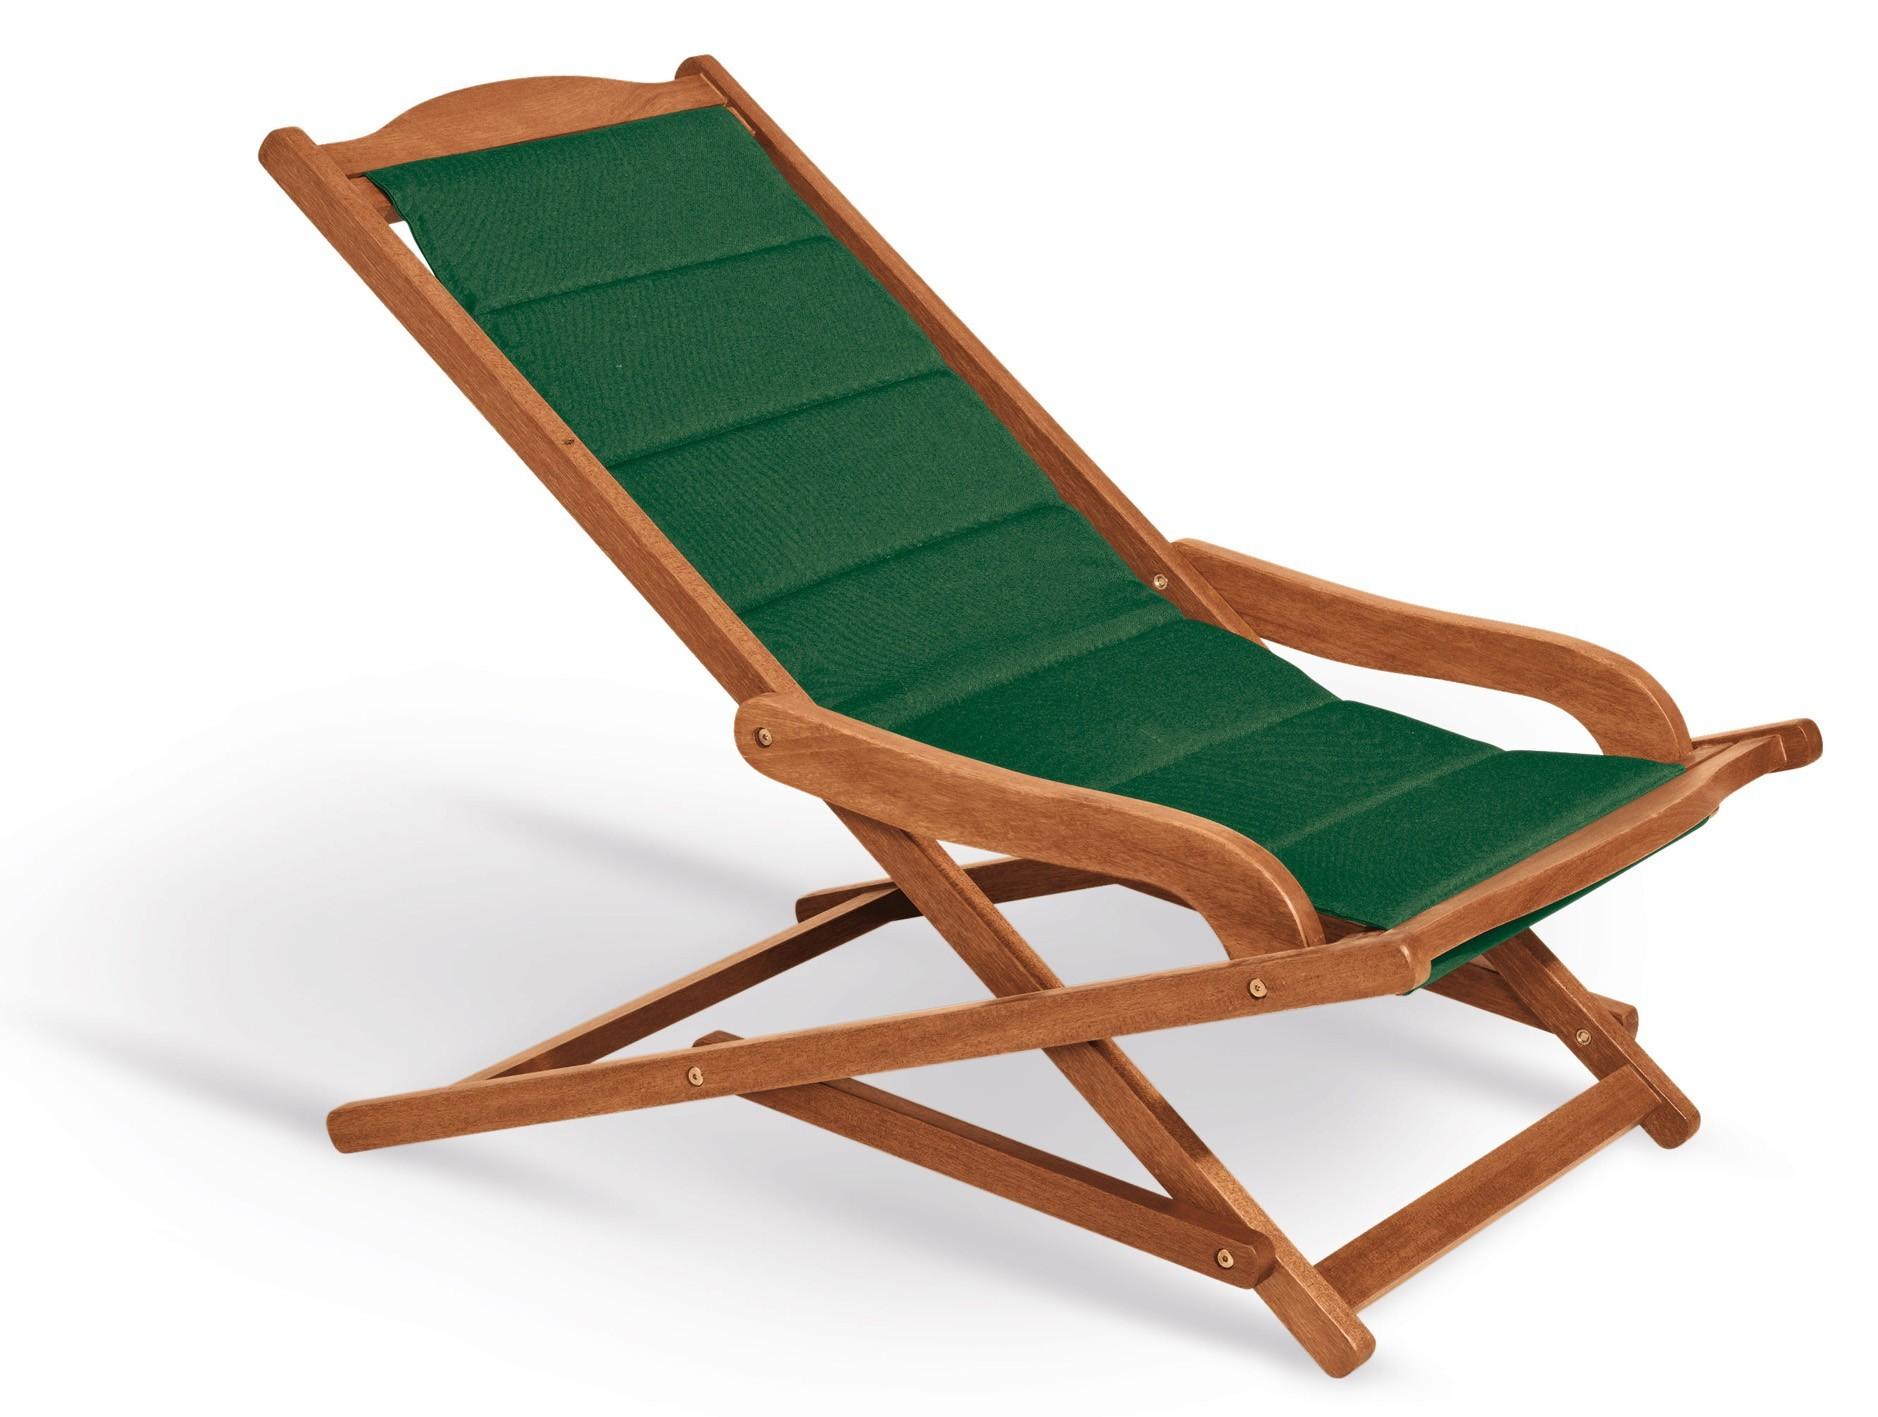 Ricambio cuscino sedia sdraio casamia idea di immagine - Sedia sdraio imbottita ikea ...